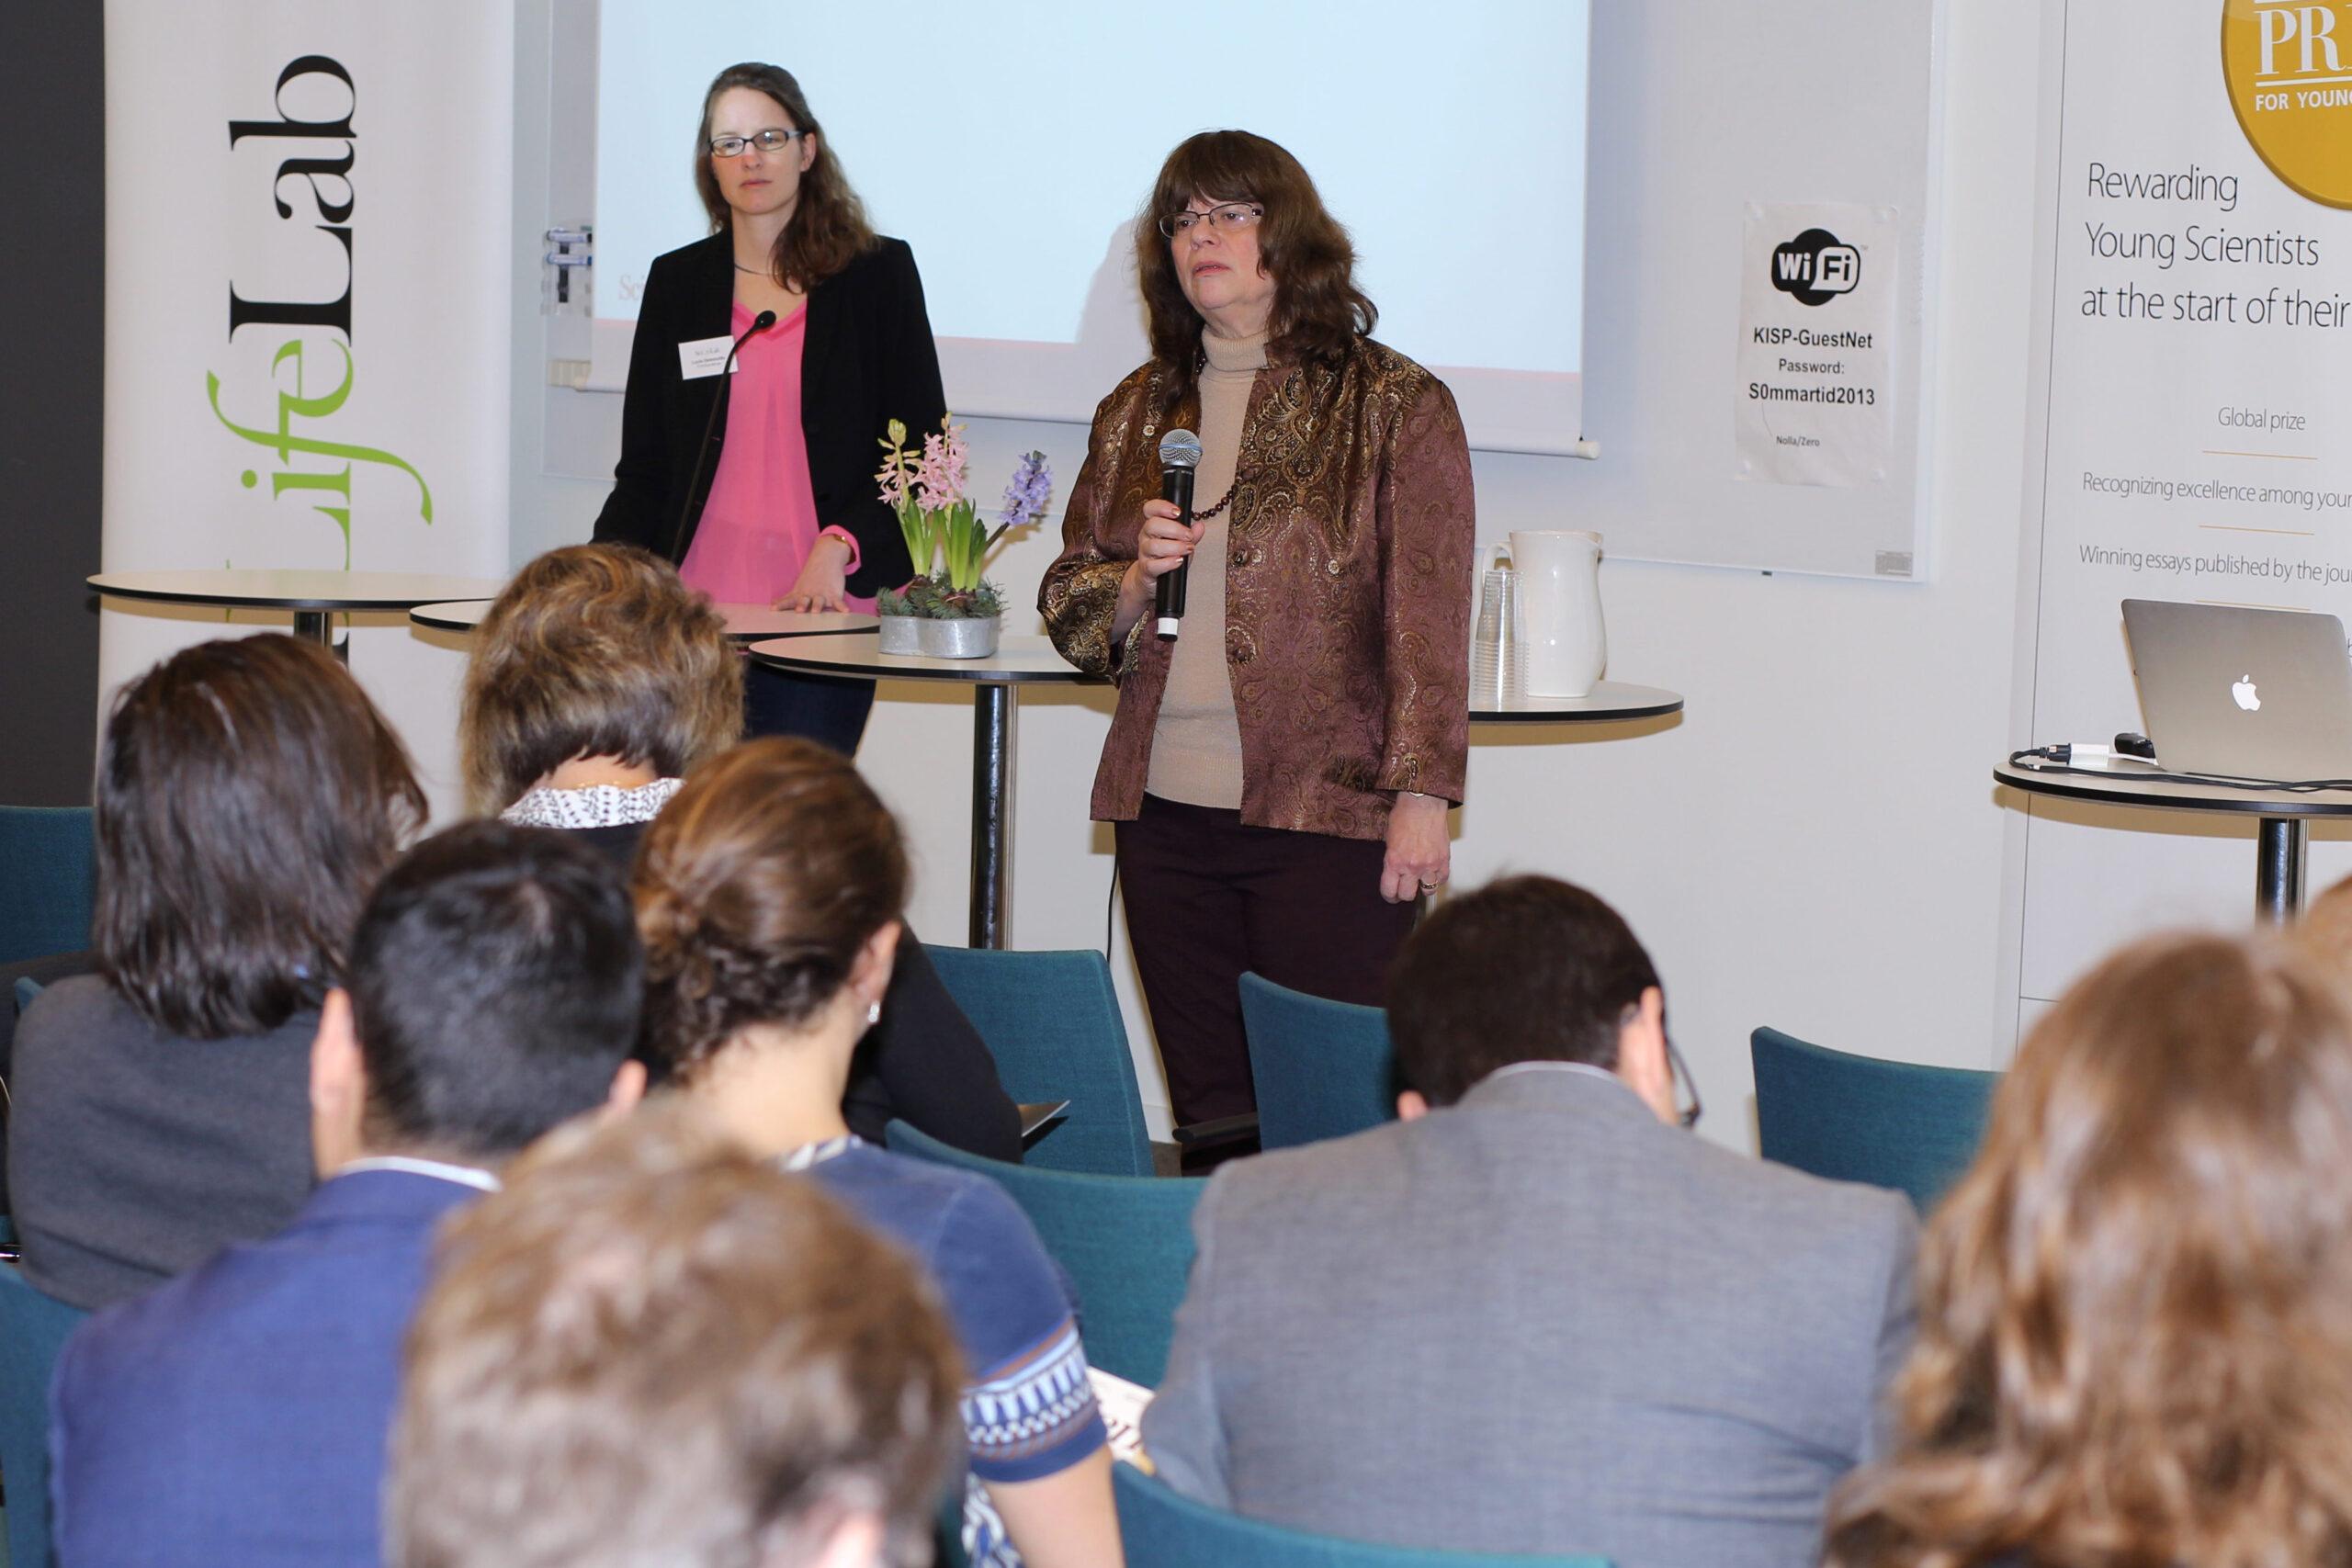 Barbara Jasny, Deputy Editor Emeritus at Science, and moderator Lucie Delemotte, SciLifeLab Fellow.